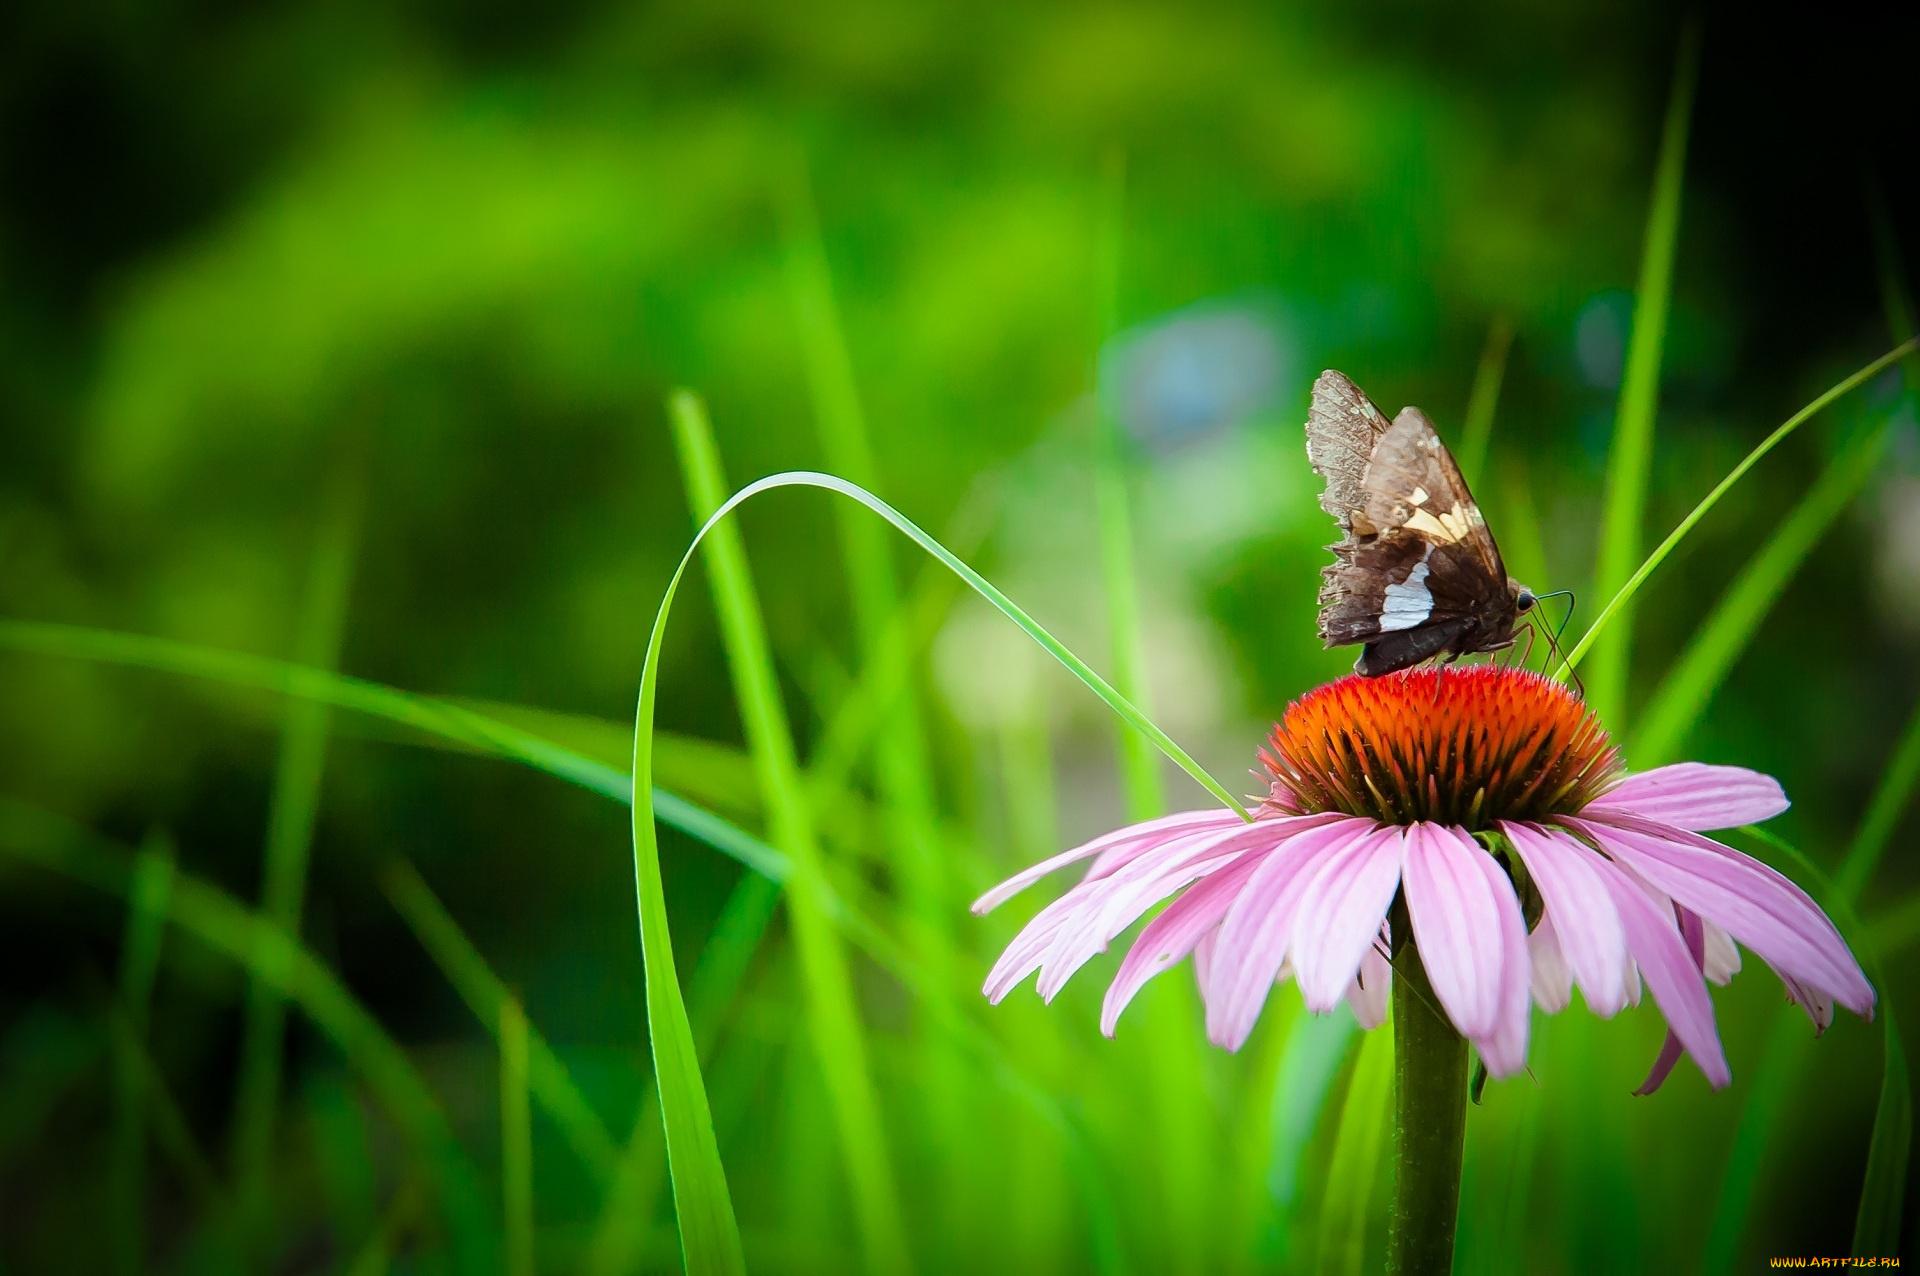 девушки банка природа животные бабочка трава бесплатно